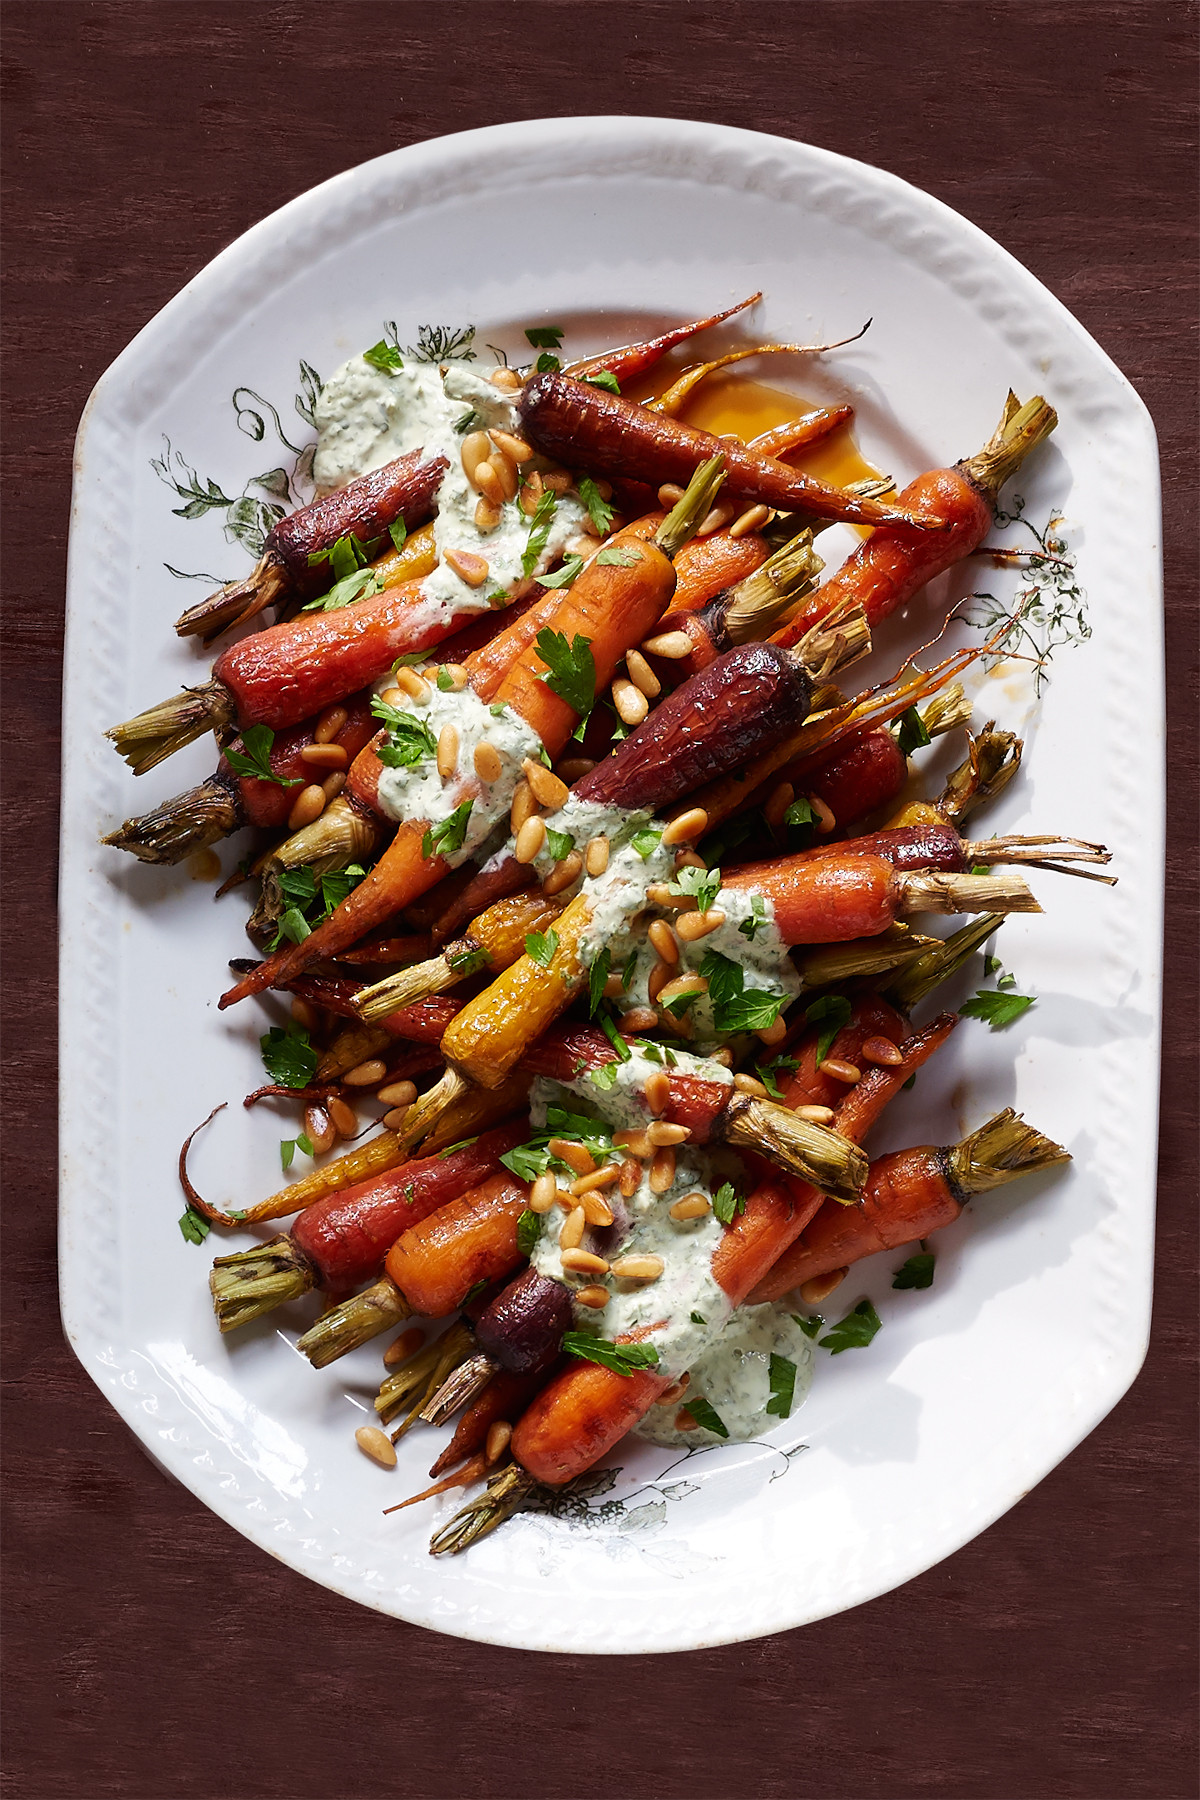 Best Christmas Vegetable Side Dishes  25 Easy Ve able Side Dishes Recipes for Best Ve able